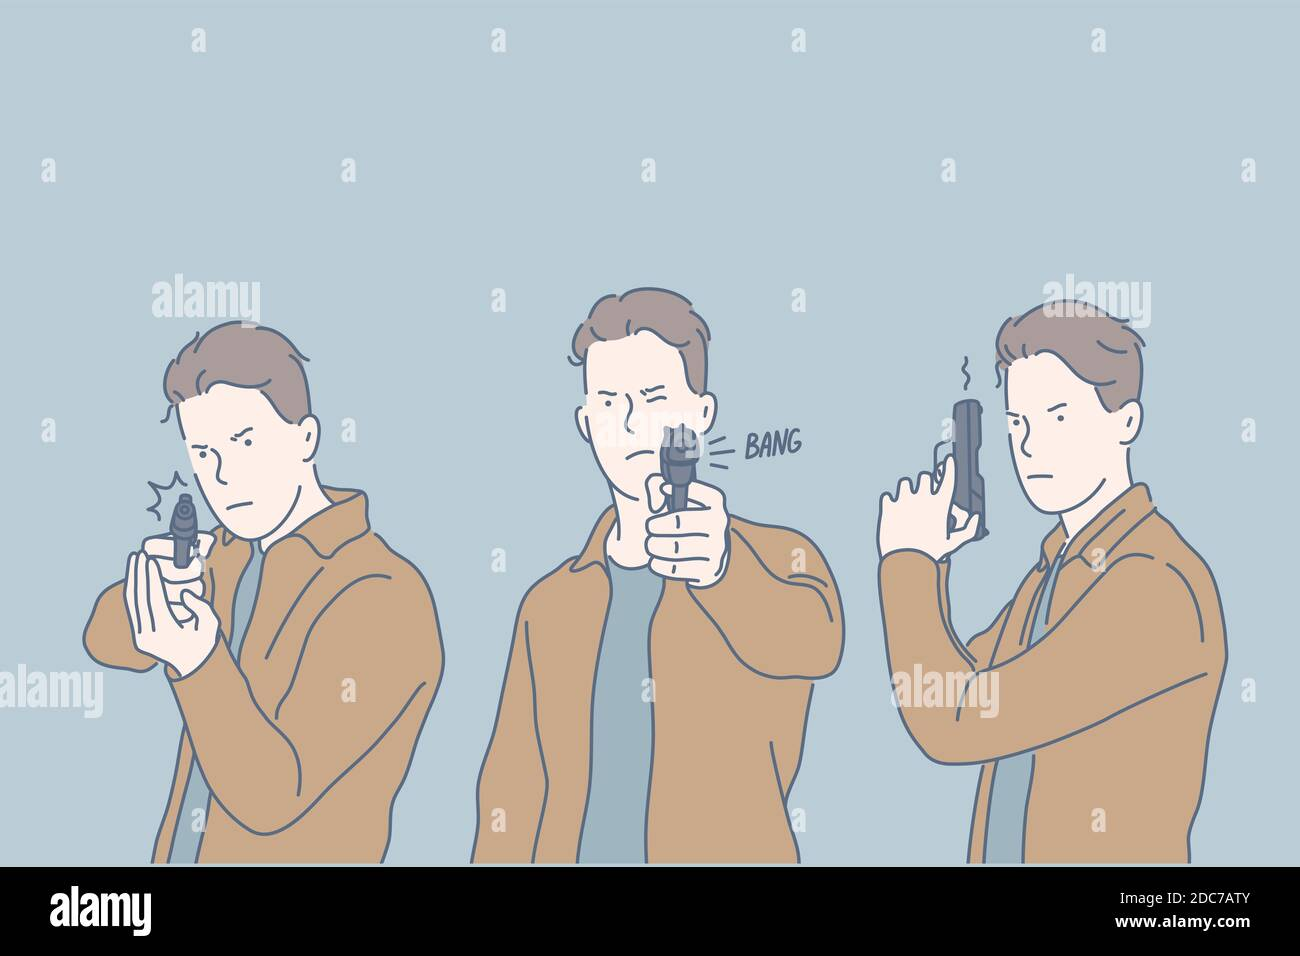 Selfdefense, criminal, shot, set concept. Dangerous young criminal takes gun, intented to kill. Serious killer took shot and hit target. Focused man p Stock Vector